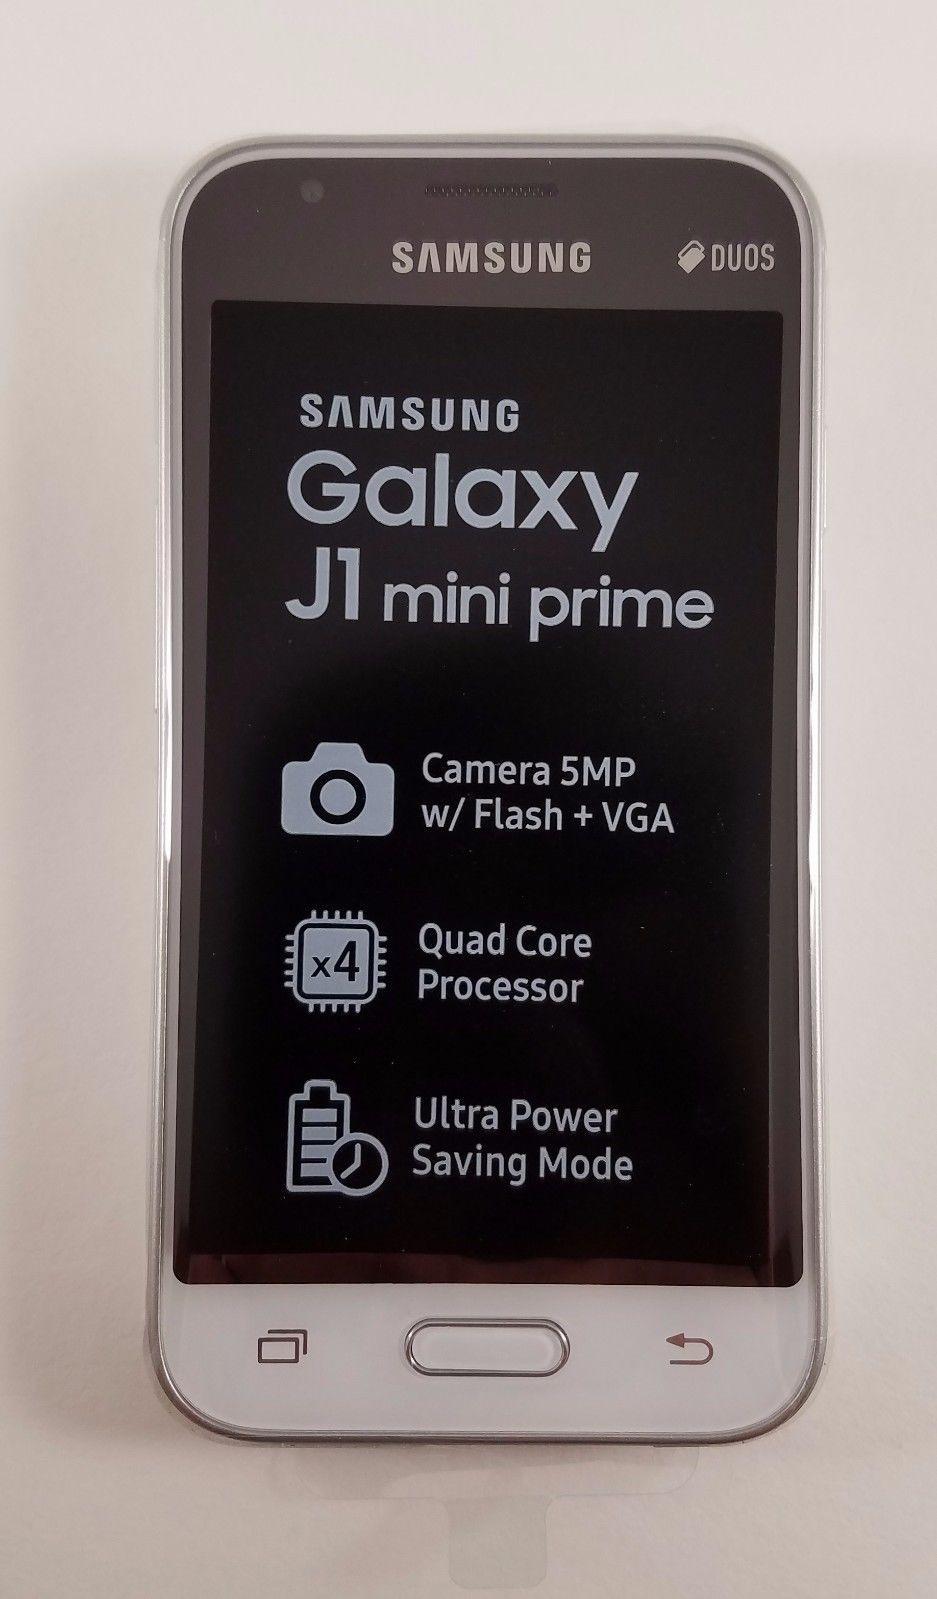 1480490620_samsung-galaxy-j1-mini-prime-6.jpg